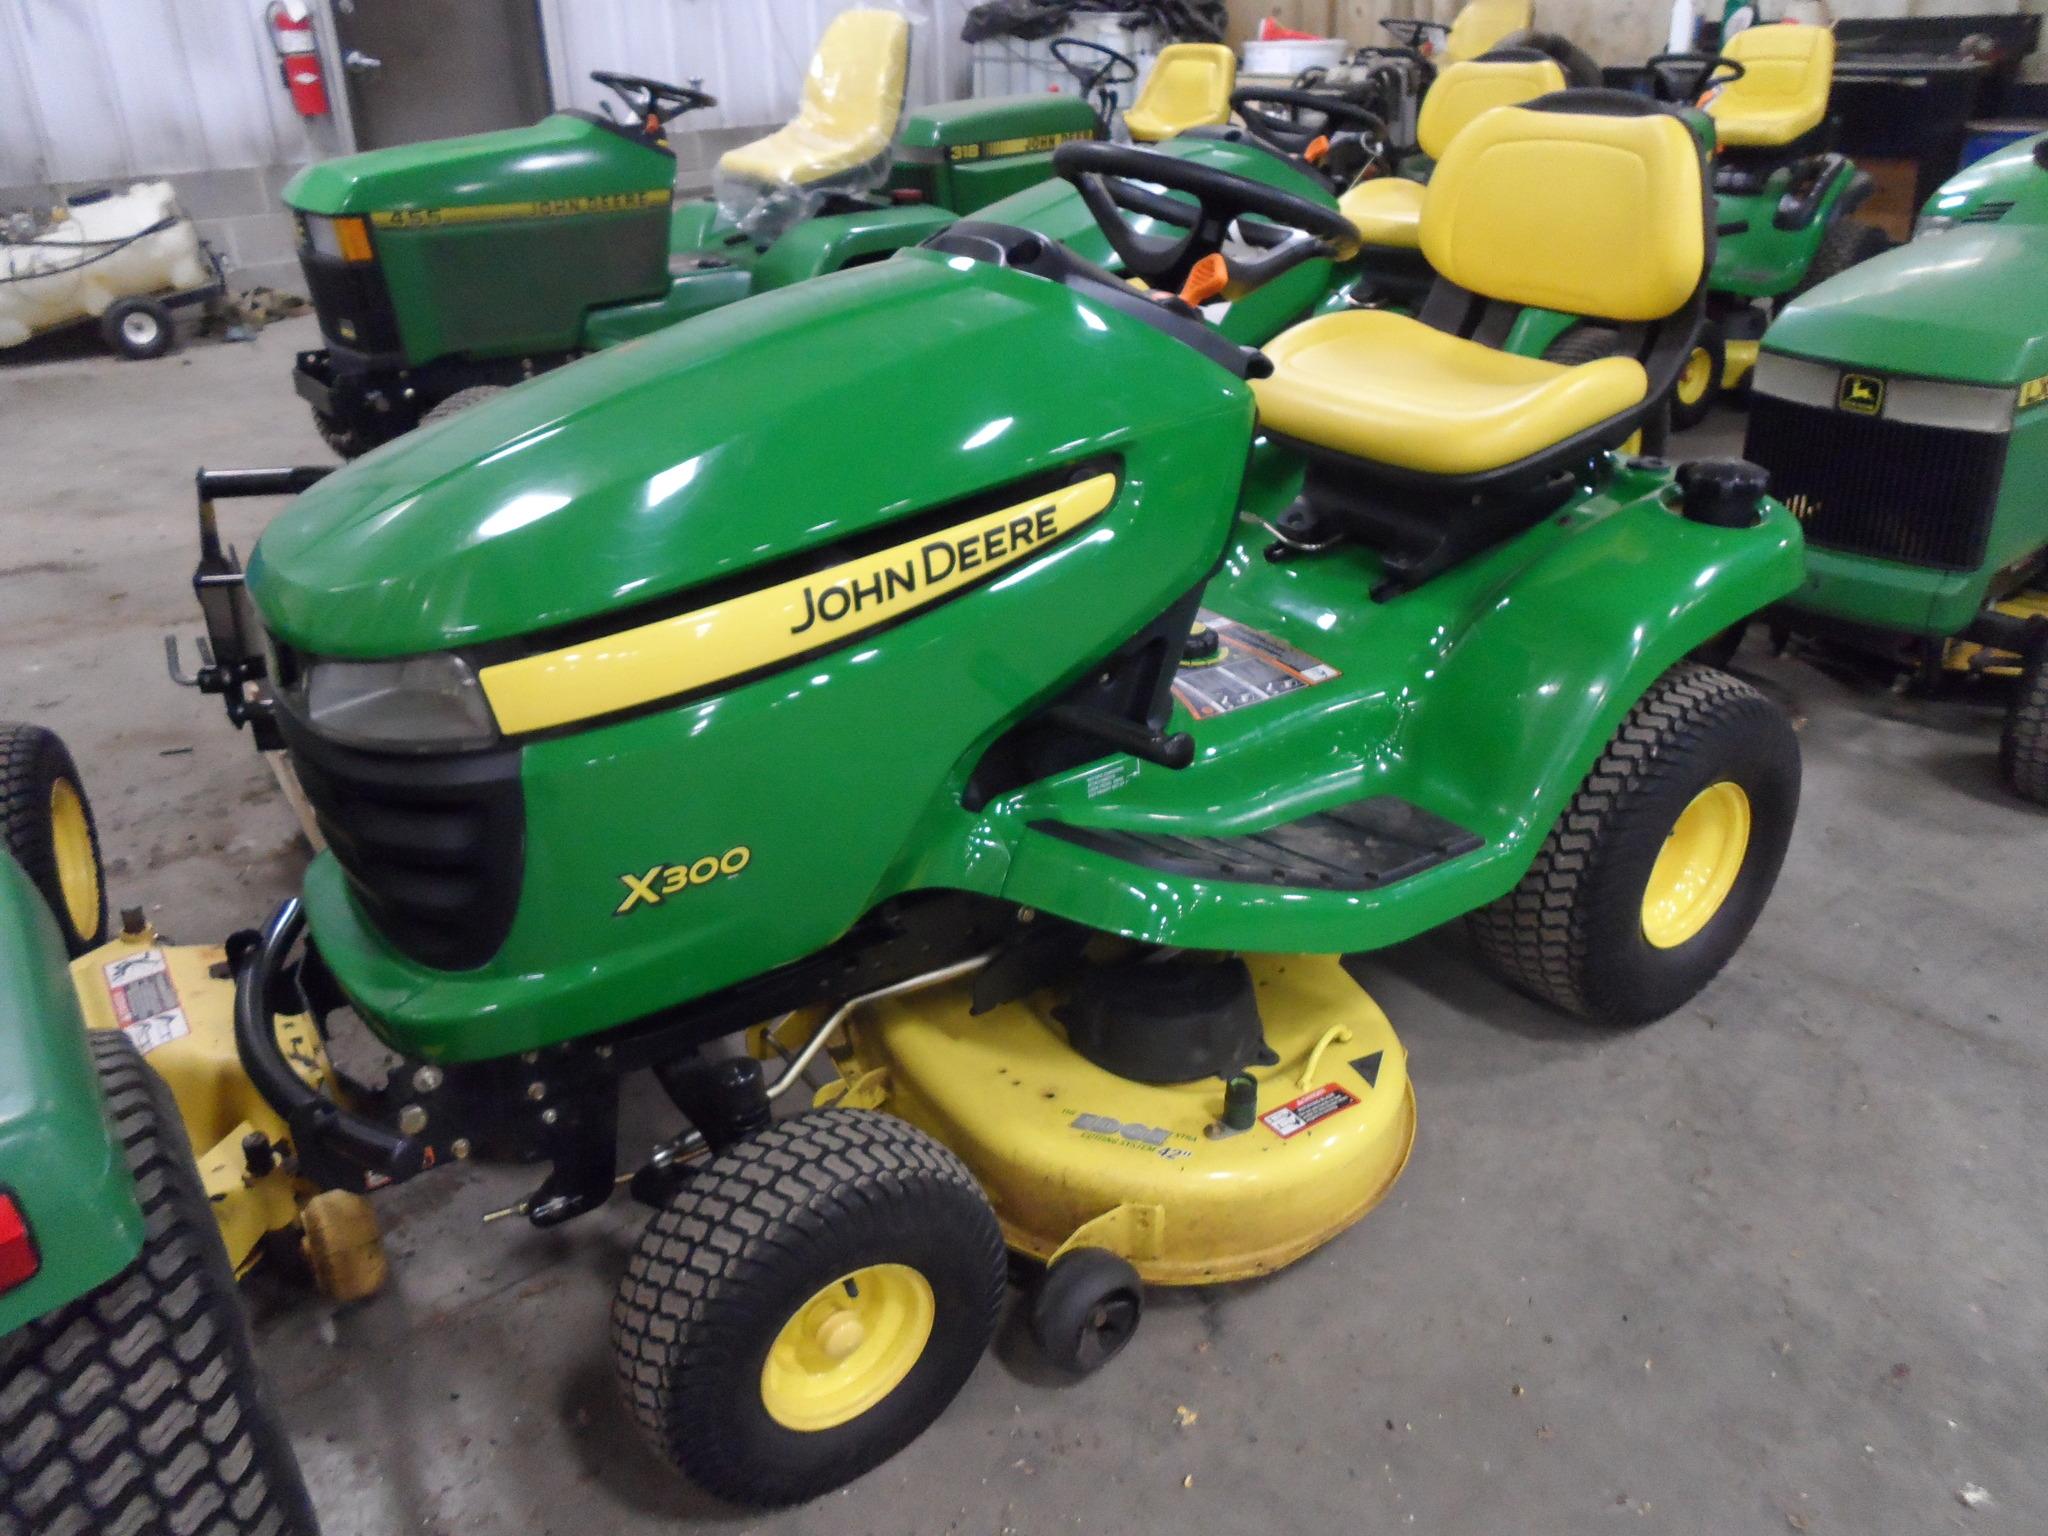 John Deere X300 Lawn Tractor : John deere lawn garden tractors for sale